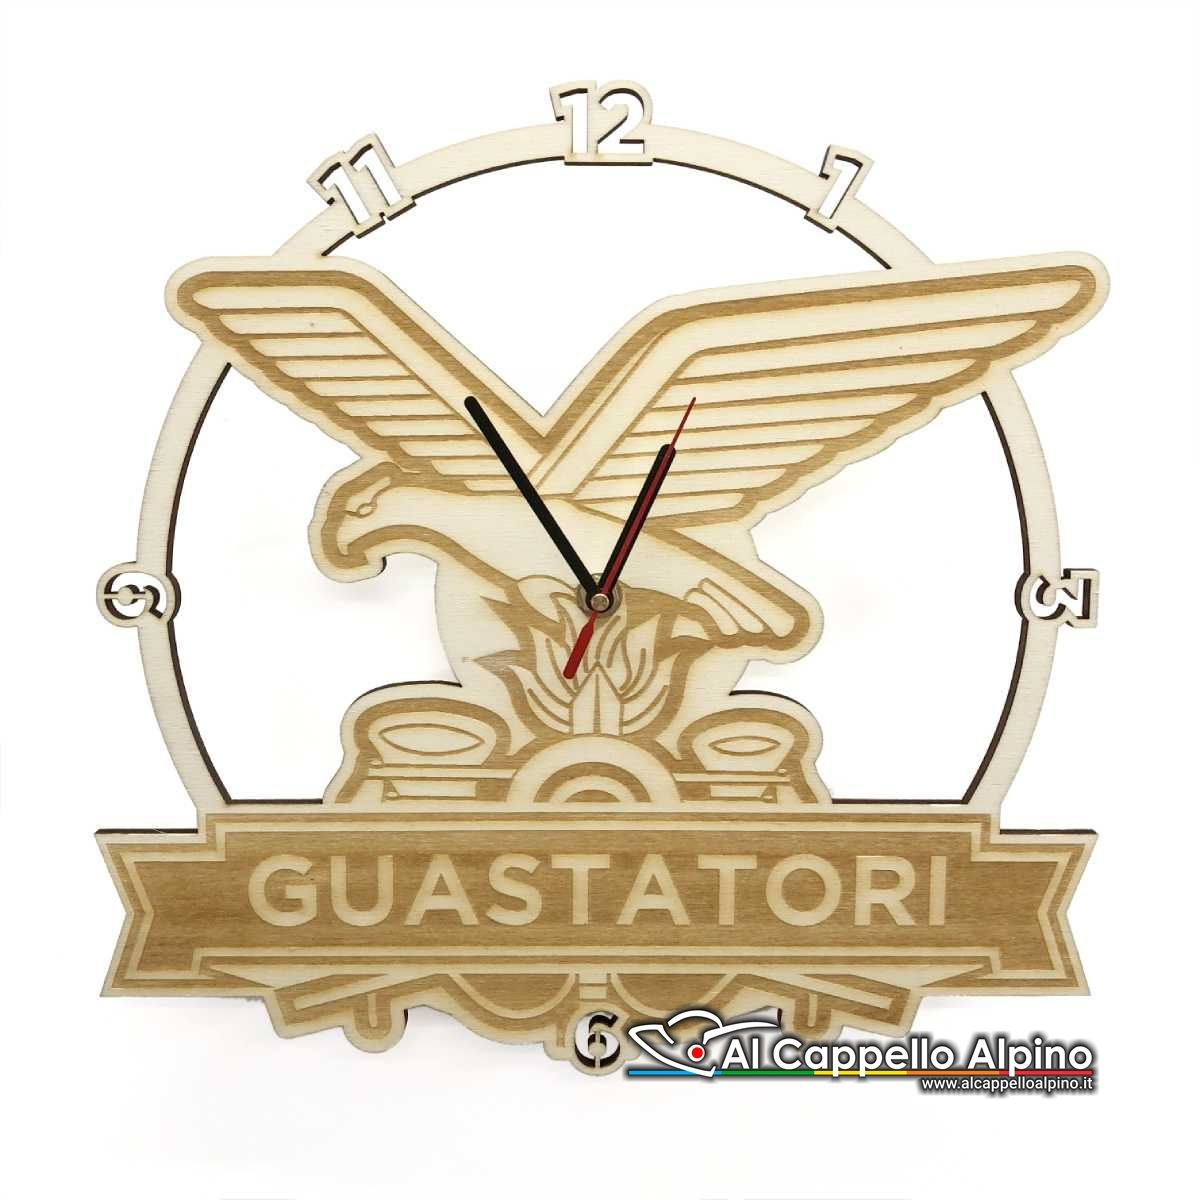 Guastatori